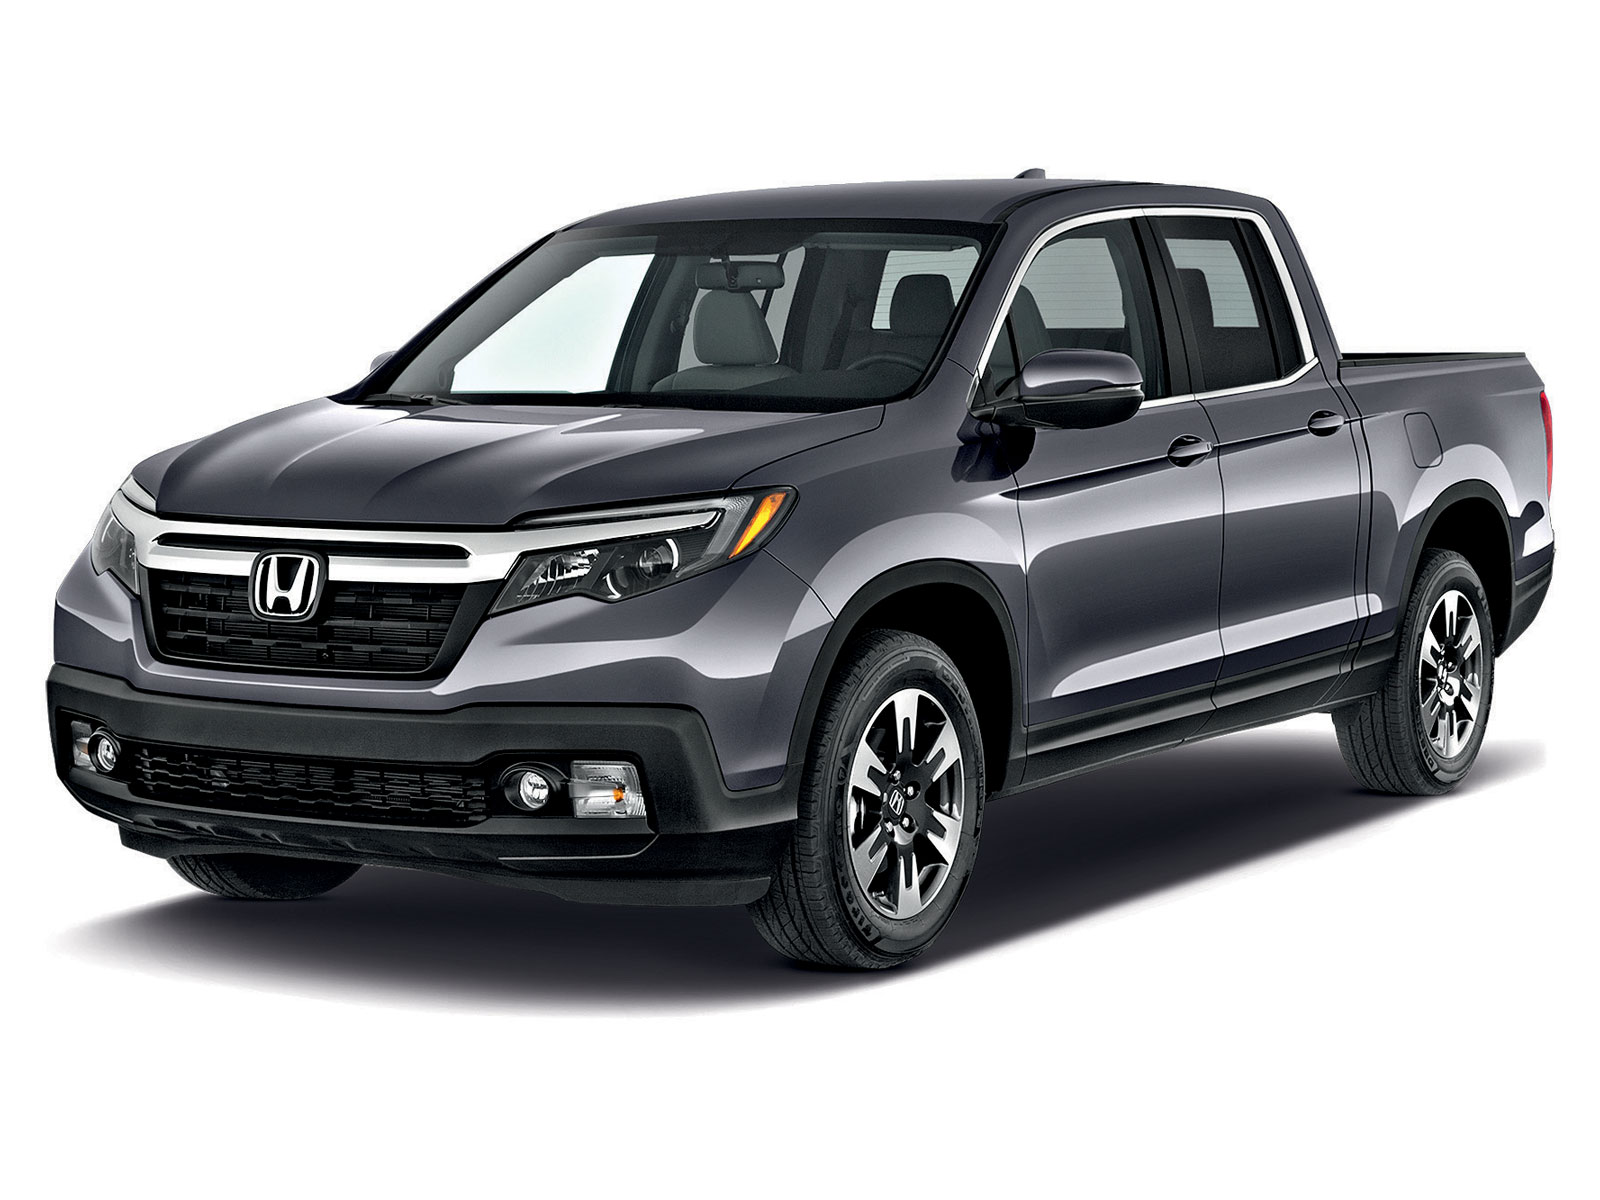 Picape Honda